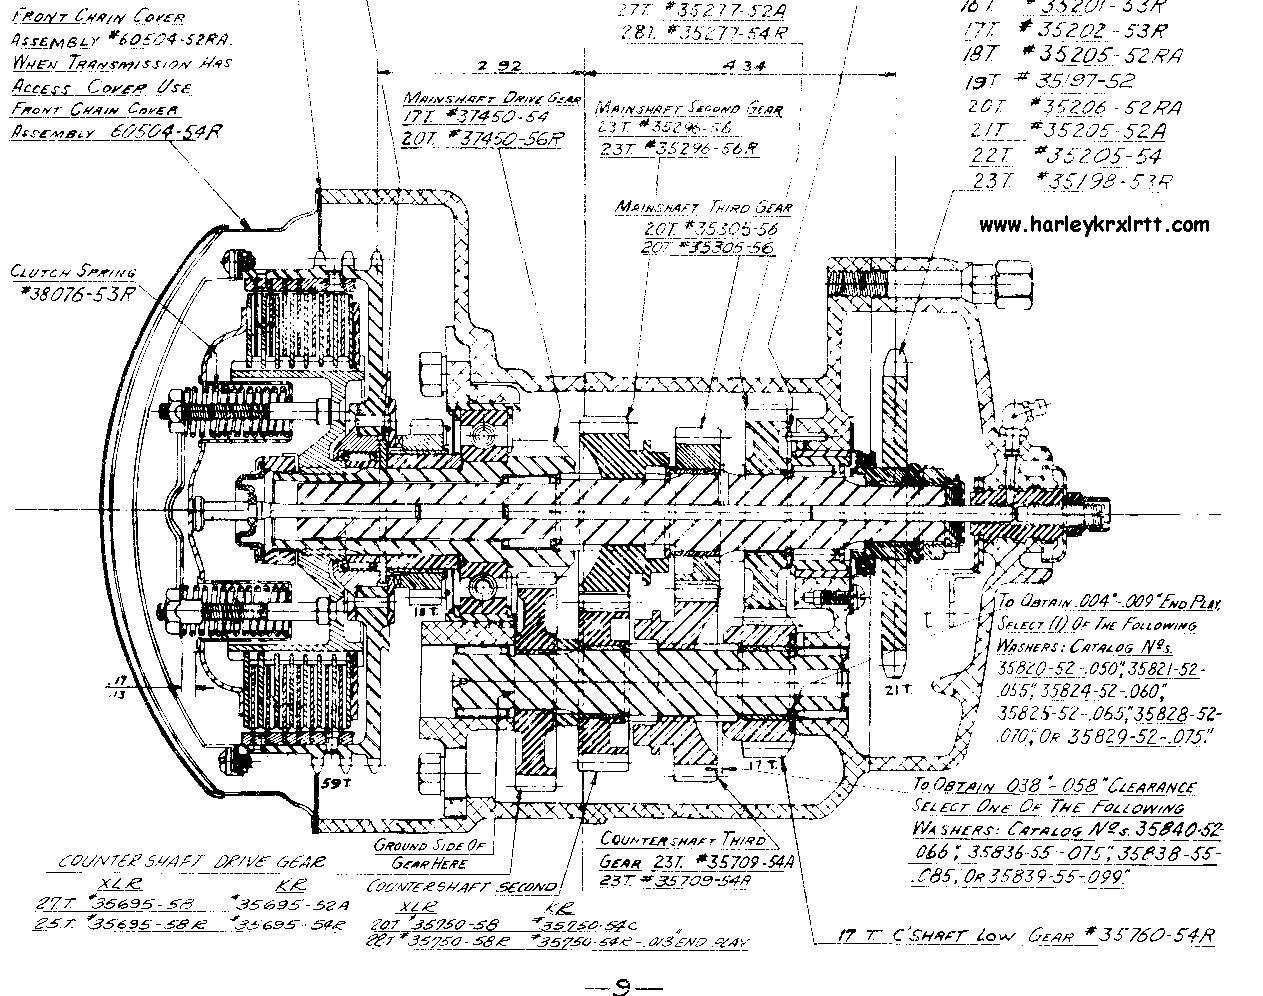 Iron Sportster Engine Diagram Schematics Wiring Diagrams 2009 Harley Davidson Design Landing Page Open Sport Org Rh 1200 Service Manual